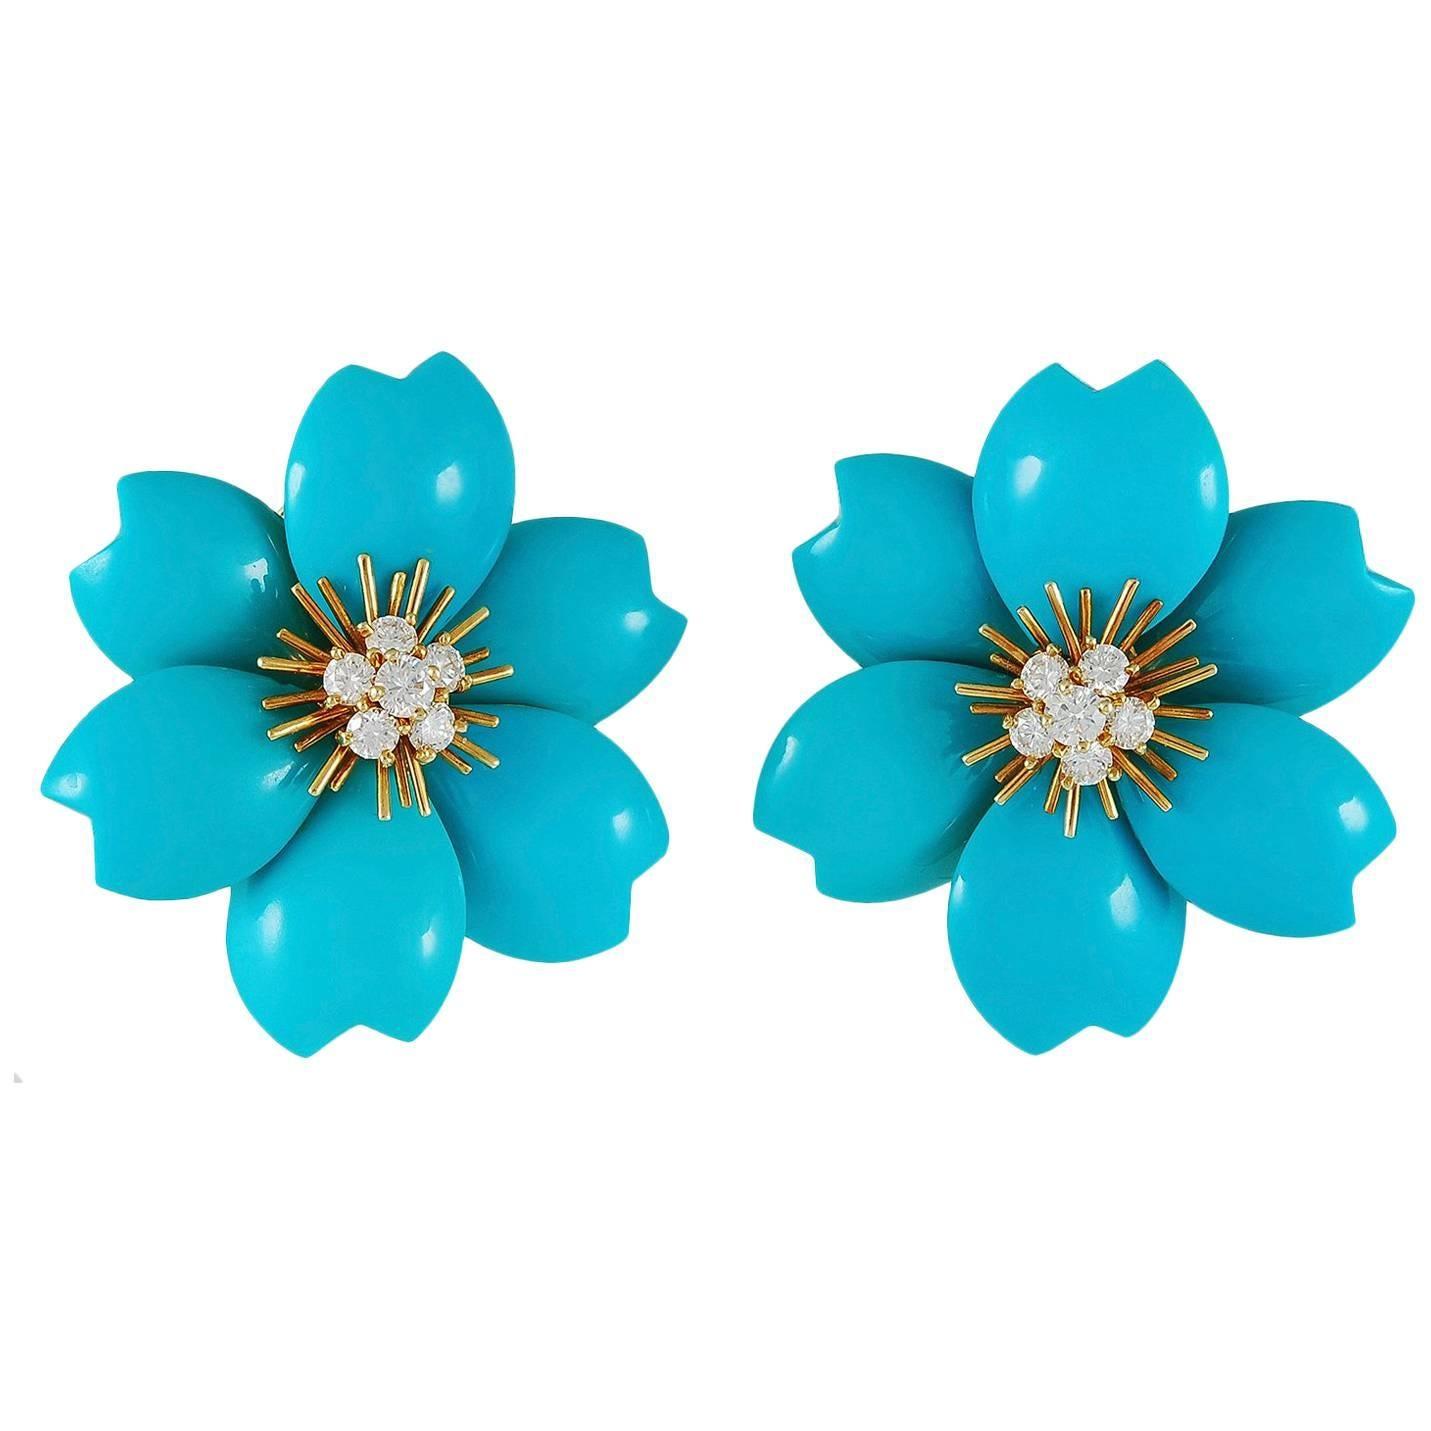 Van Cleef & Arpels Turquoise, Diamond Ear Clips